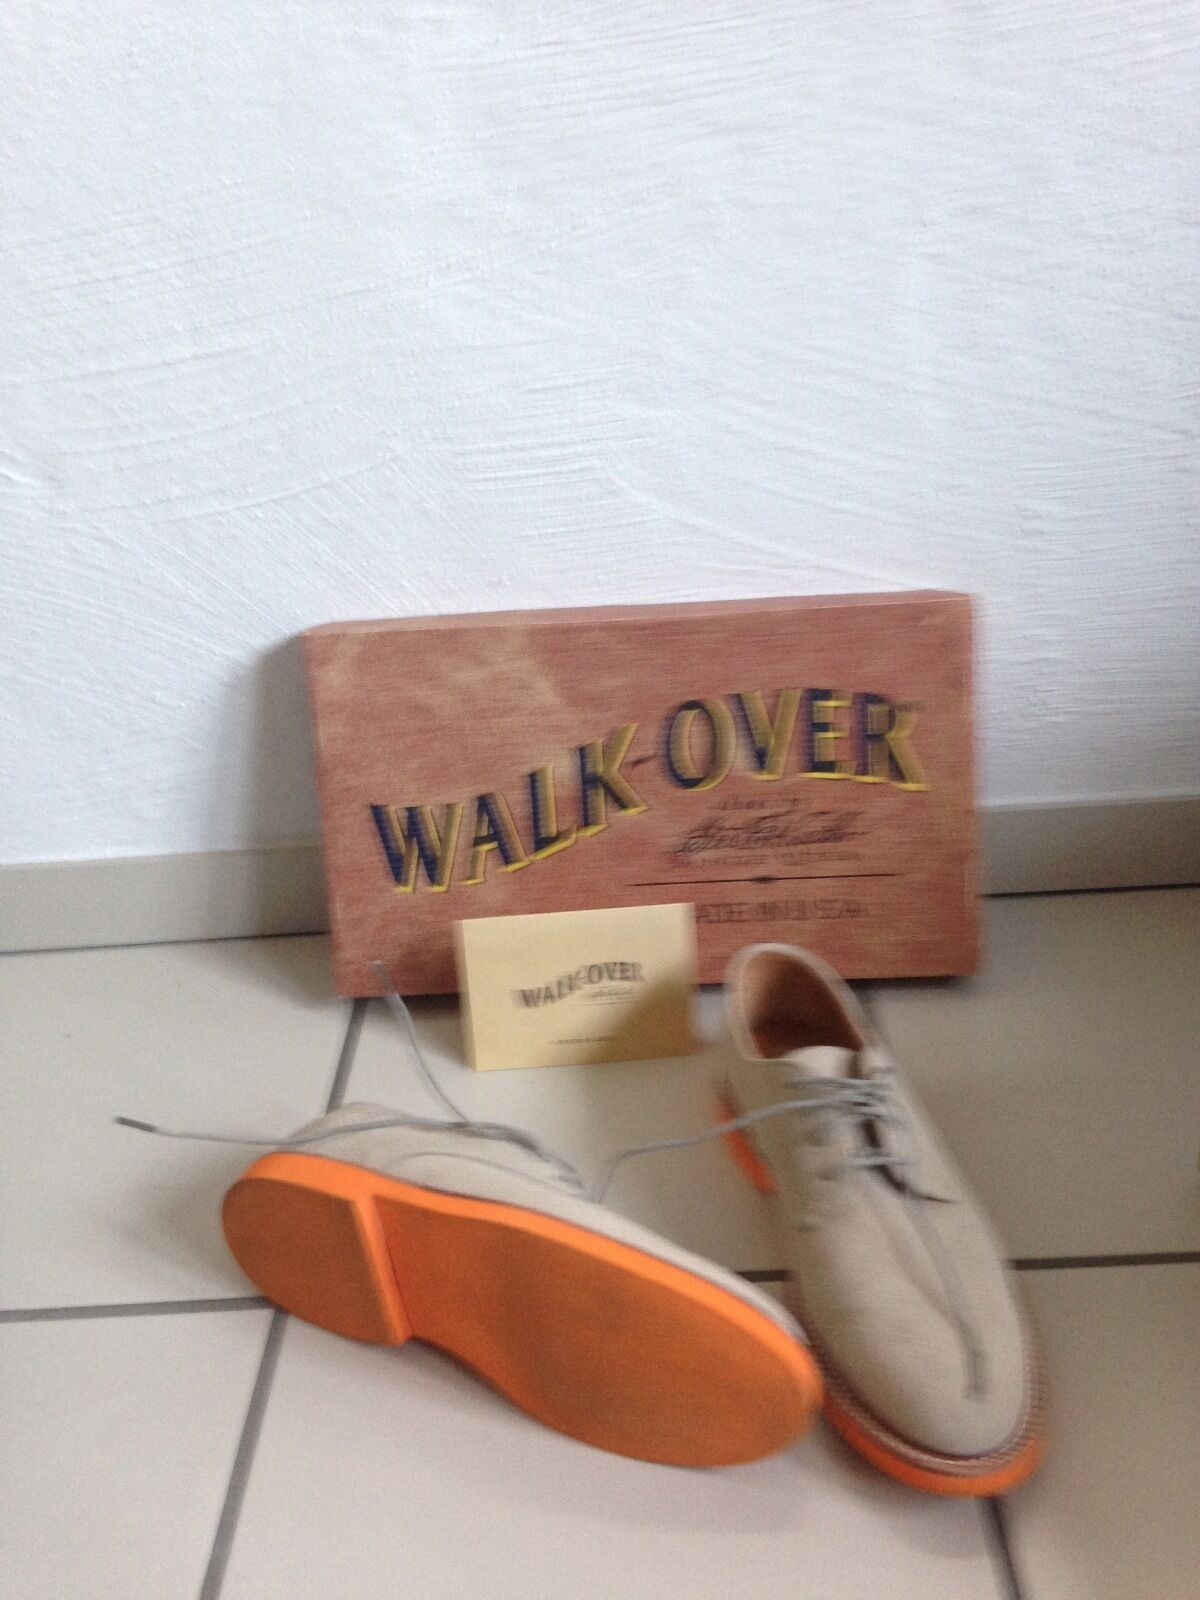 Walk-Over Damenschuhe gr.39 neu Günstige und gute Schuhe